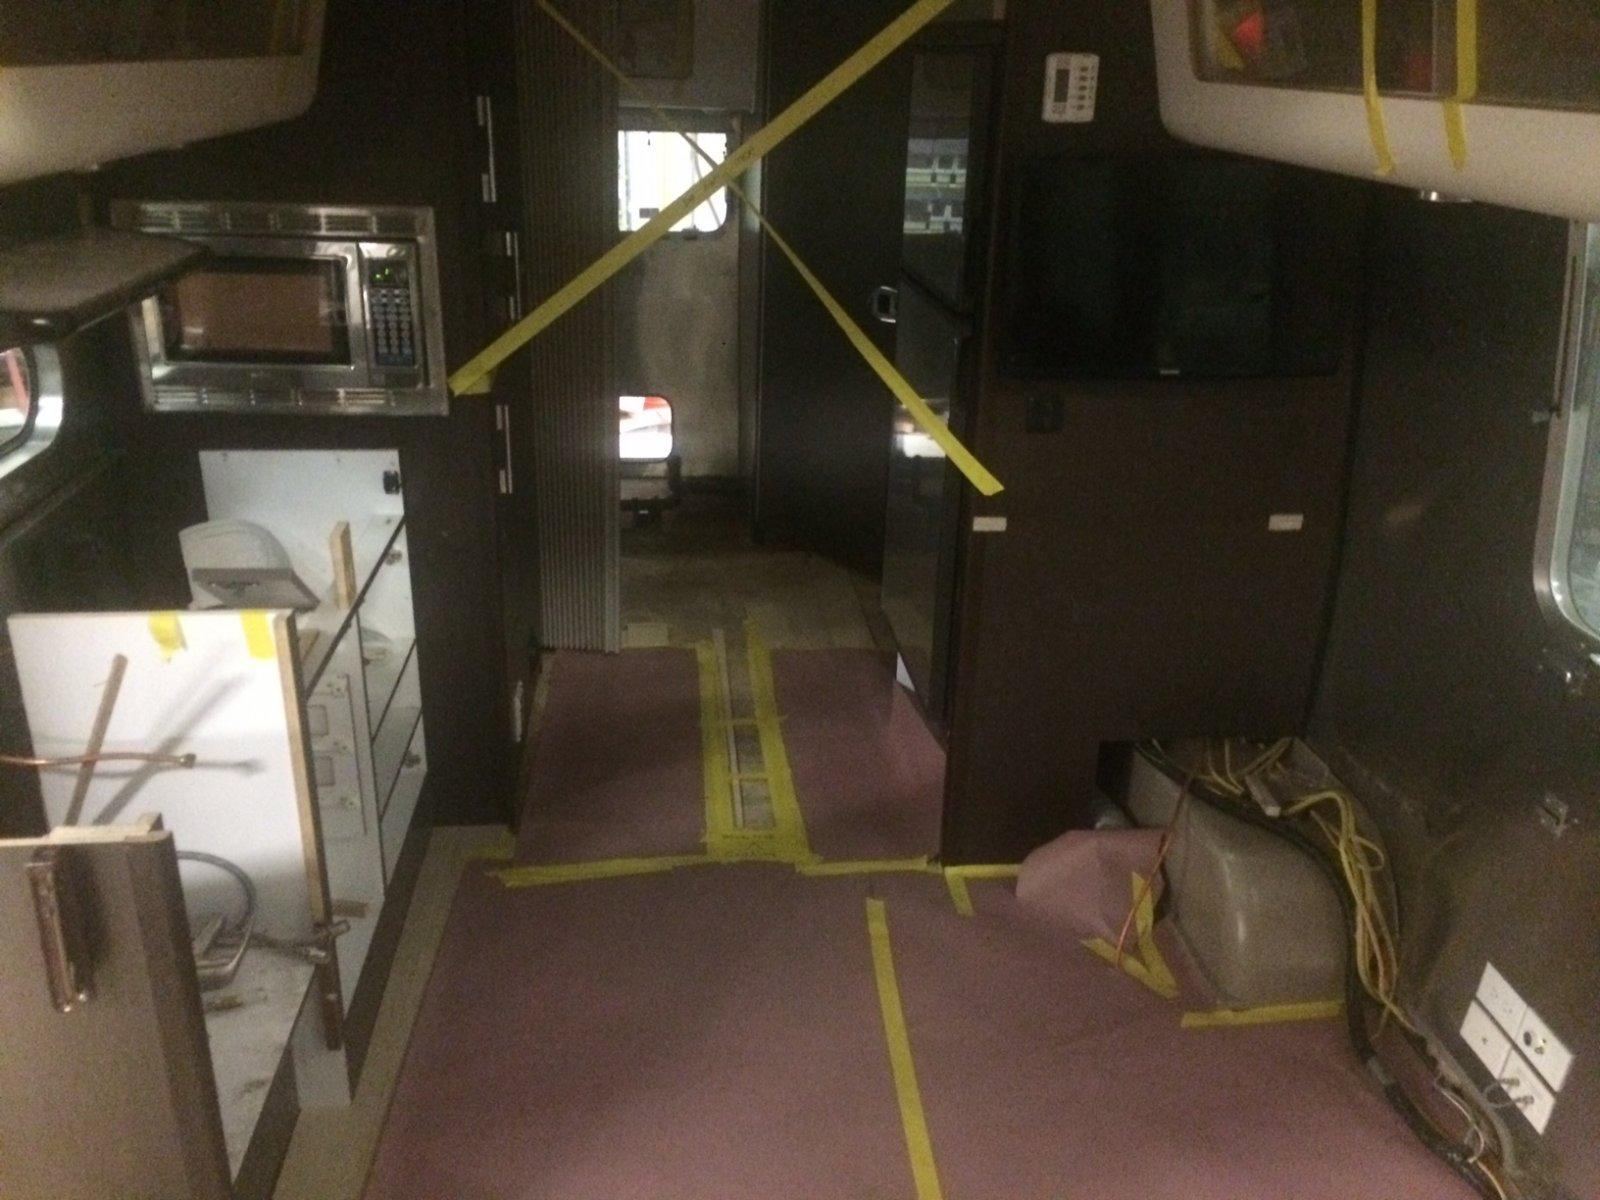 Rear Bumper Plate/Floor Leakage - Airstream Forums